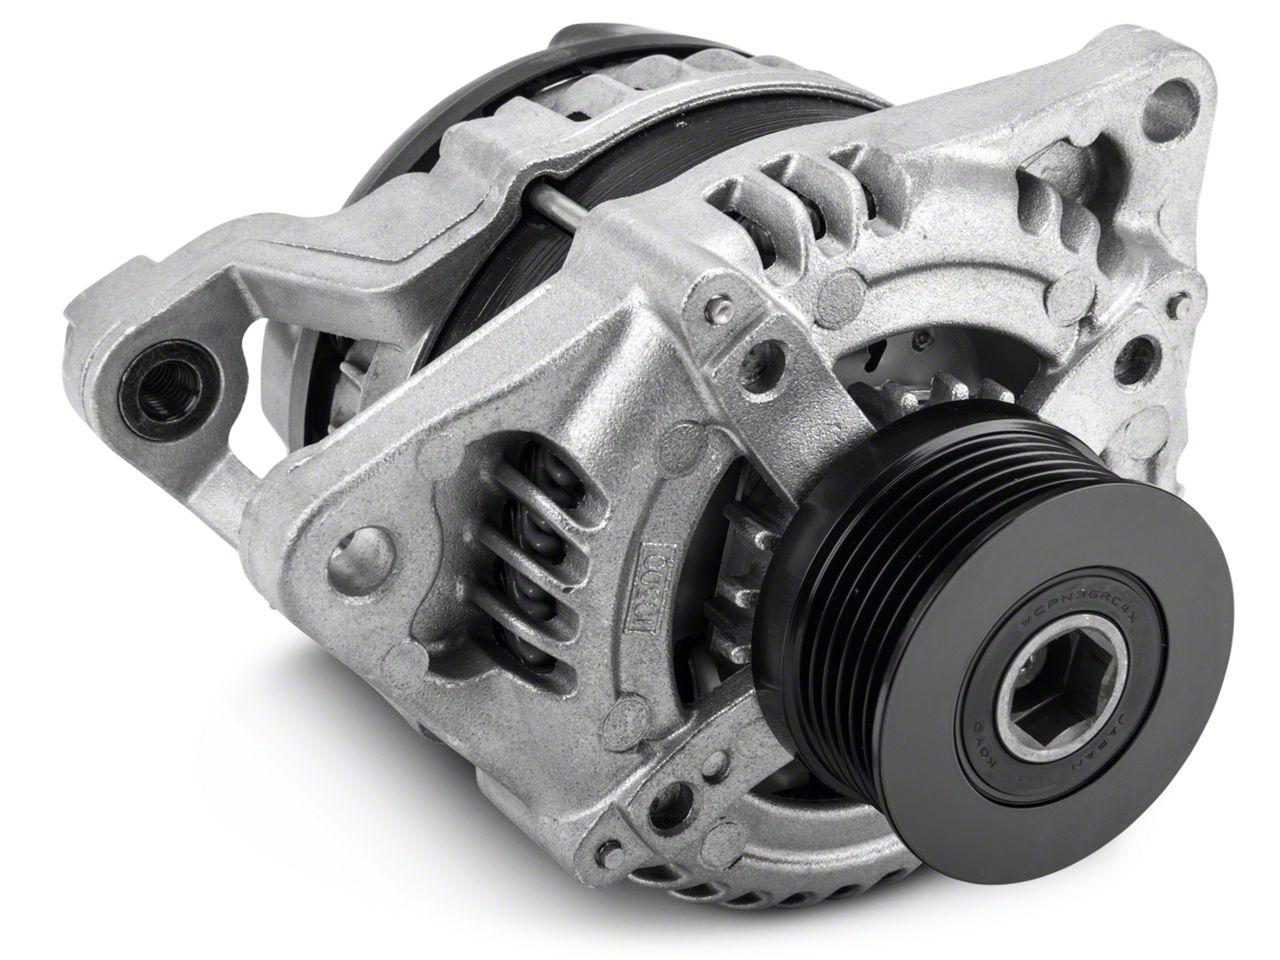 ford performance mustang 5.0l plenum cover kit m-9680-m50 ... 1996 ford alternator wiring diagram